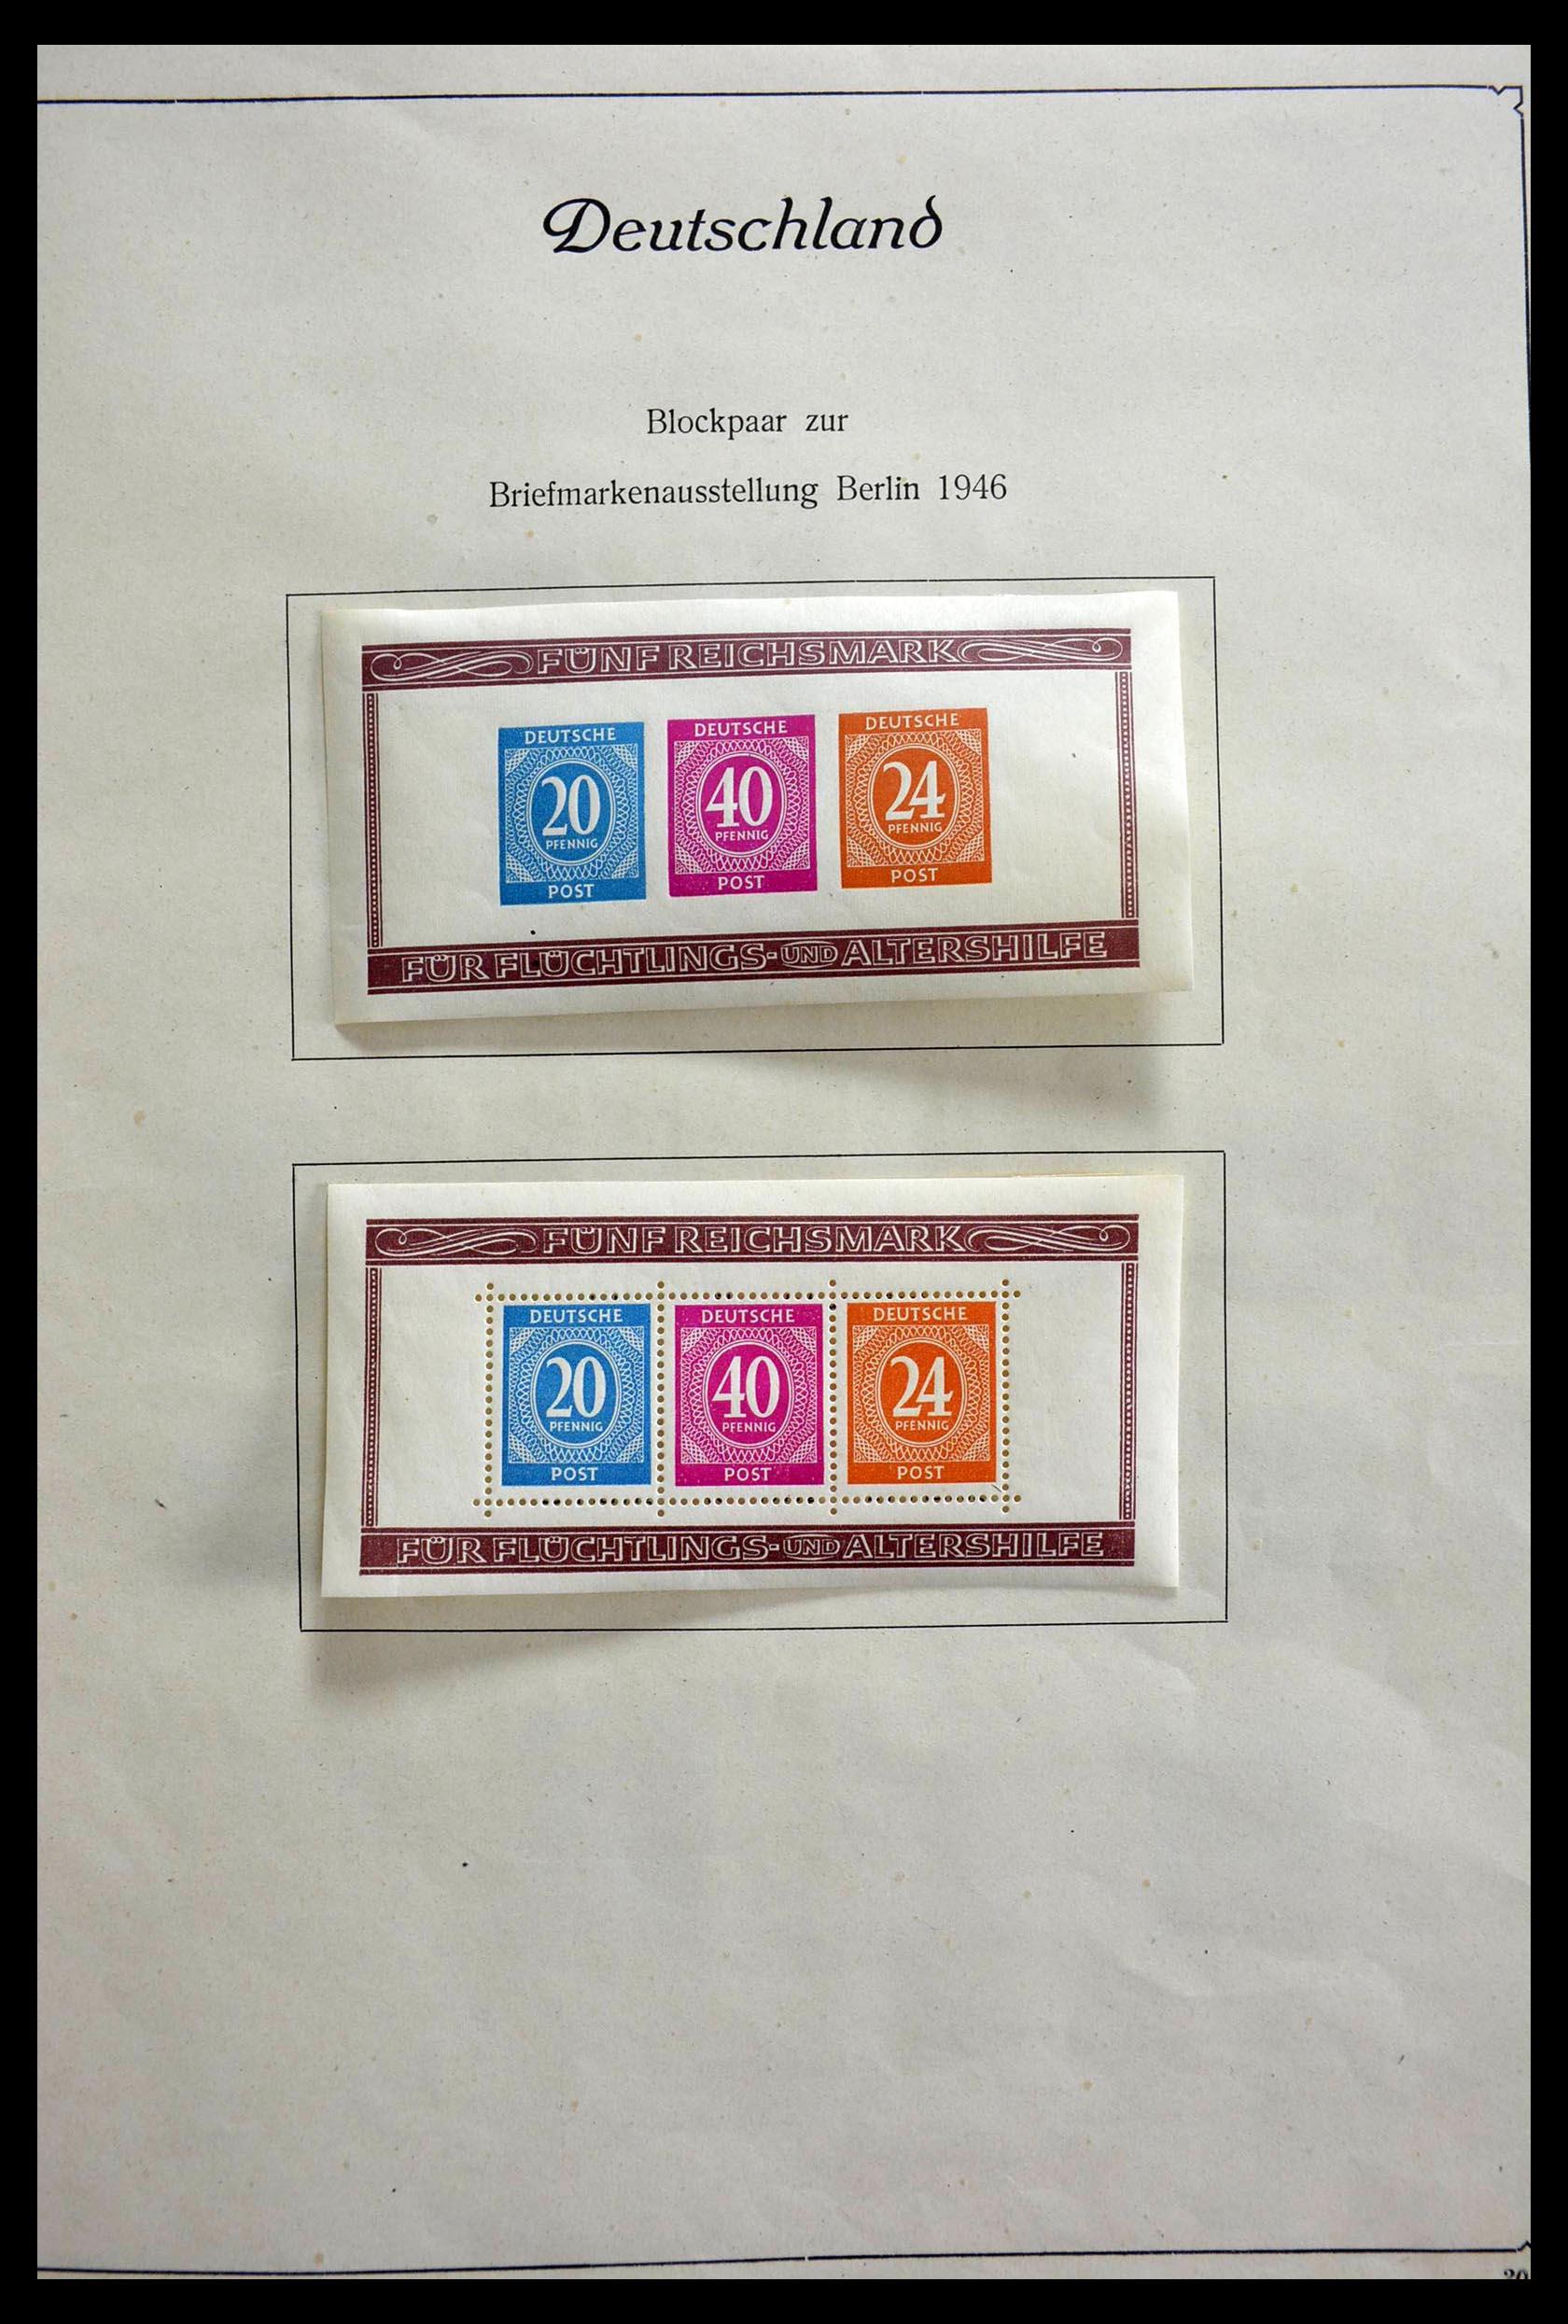 28685 002 - 28685 Germany 1946-1969.